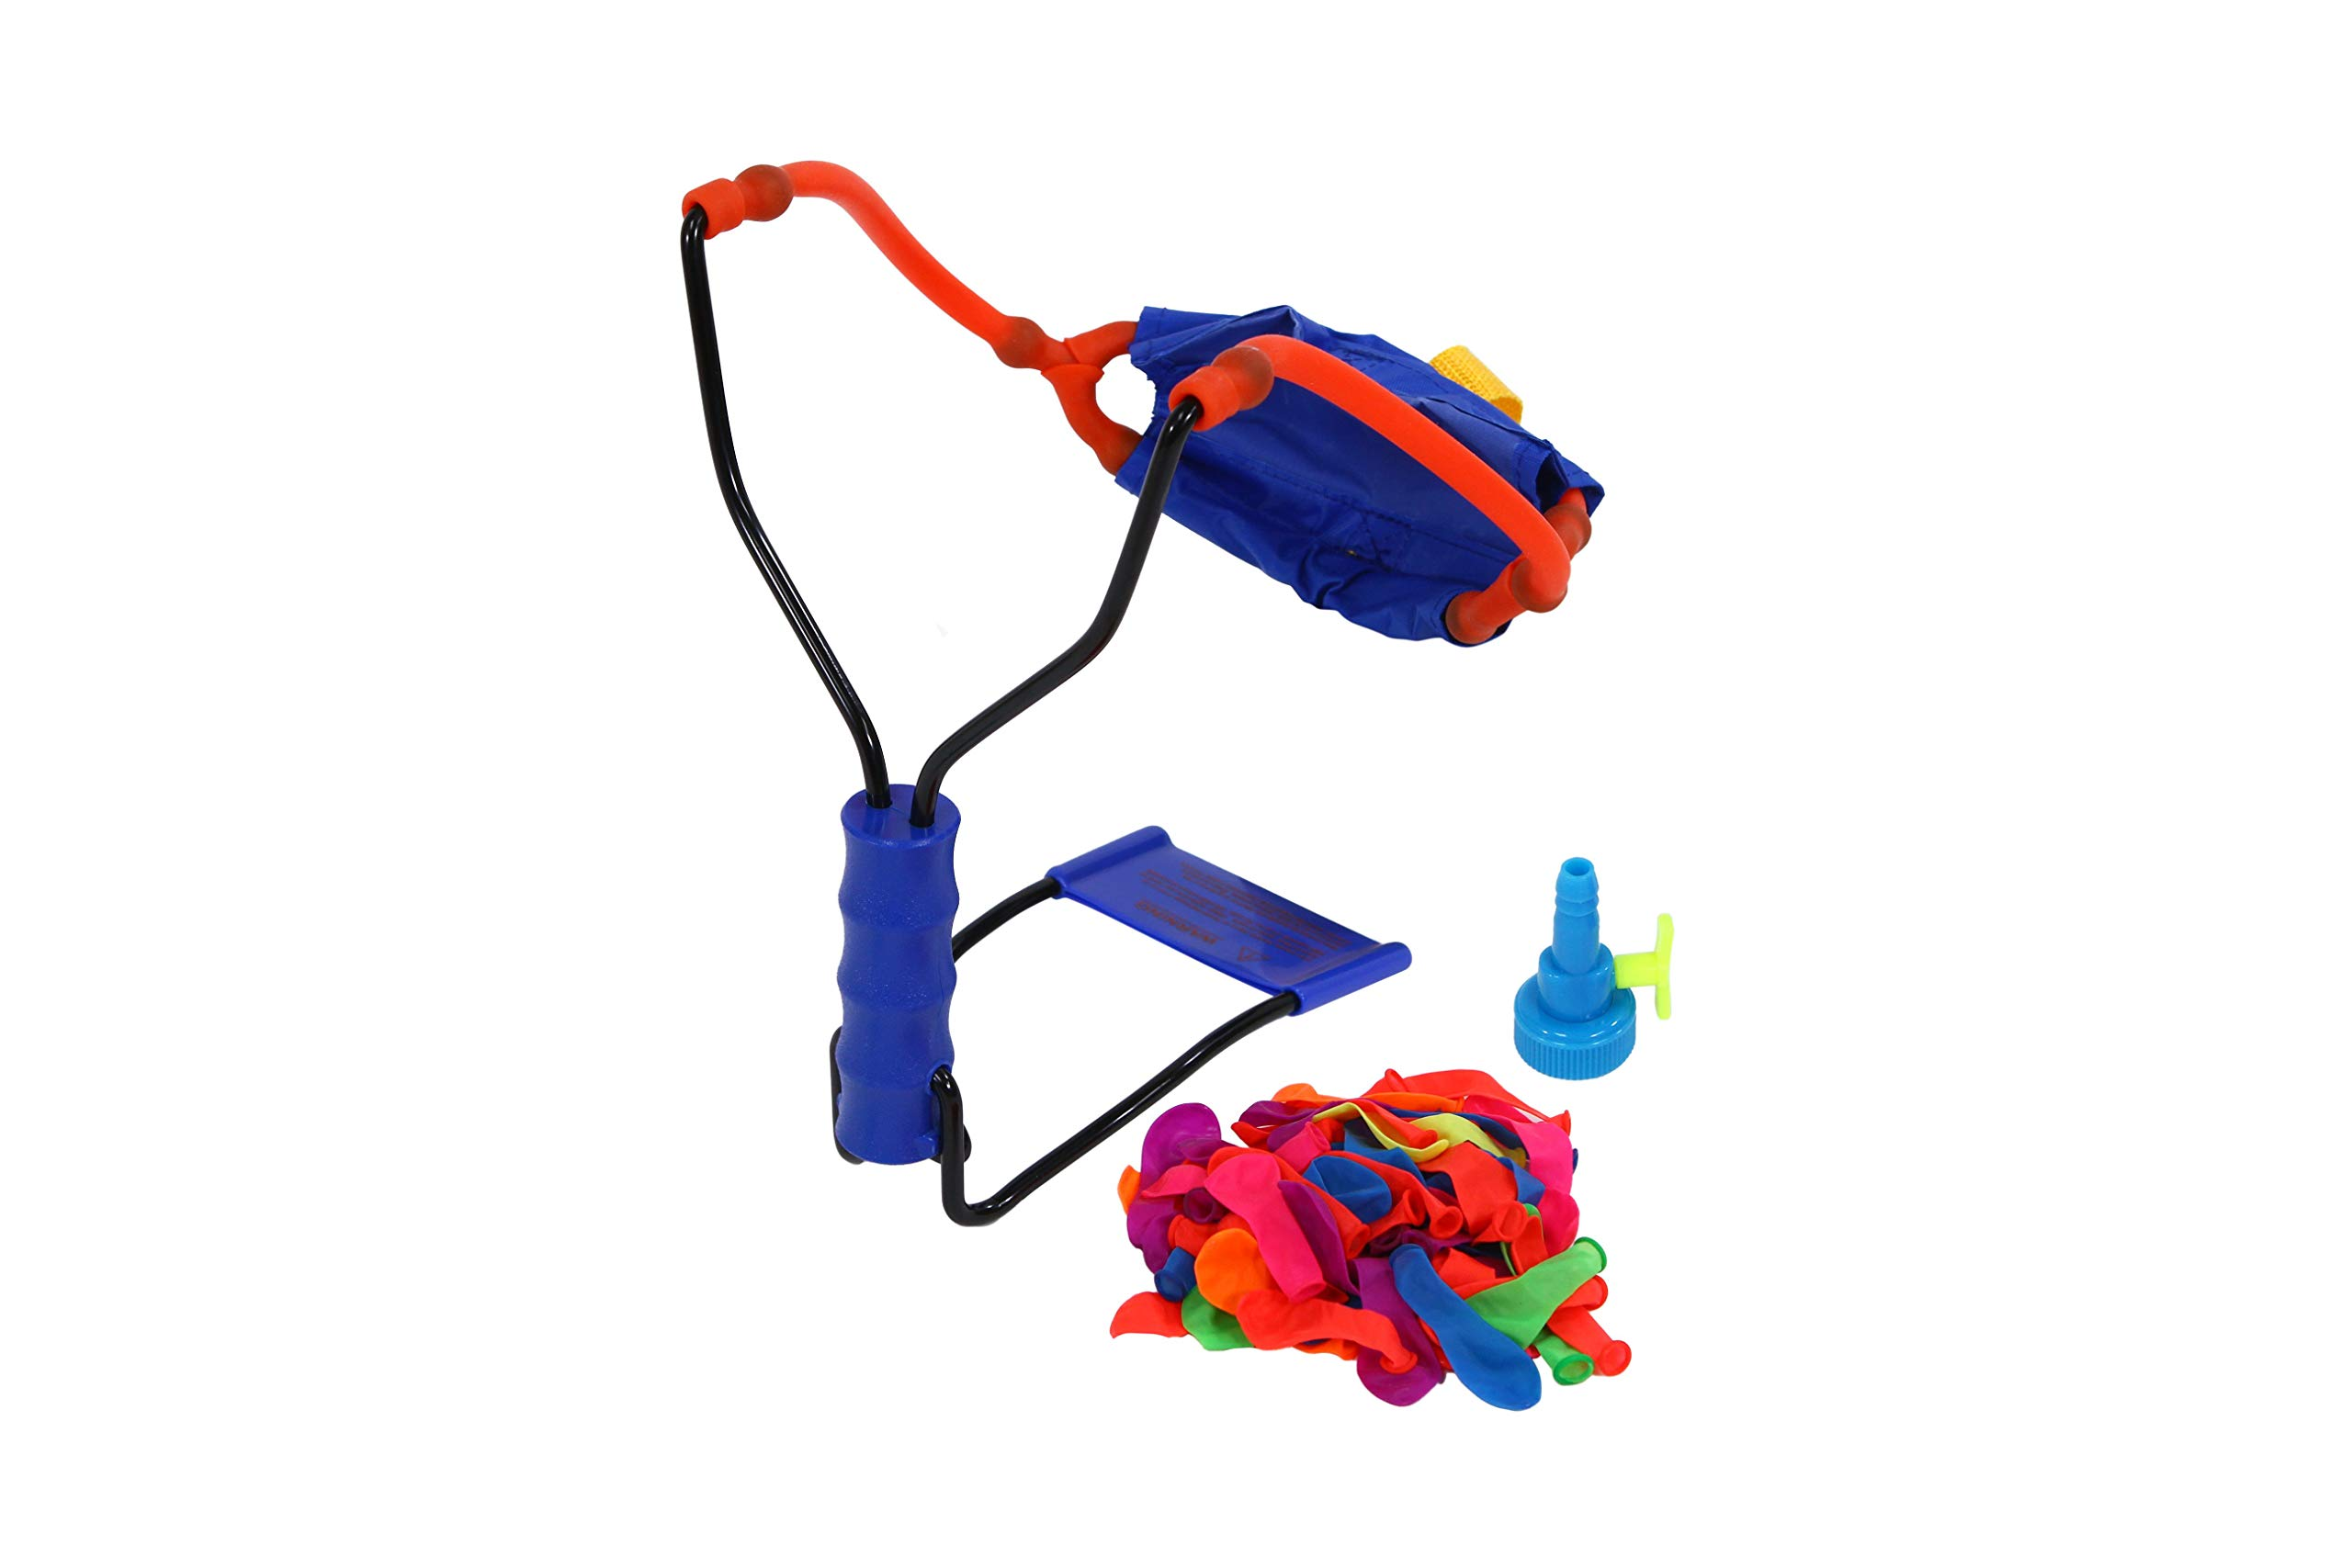 Water Sports 80082 Marine Wrist Balloon Launcher by Stream Machine